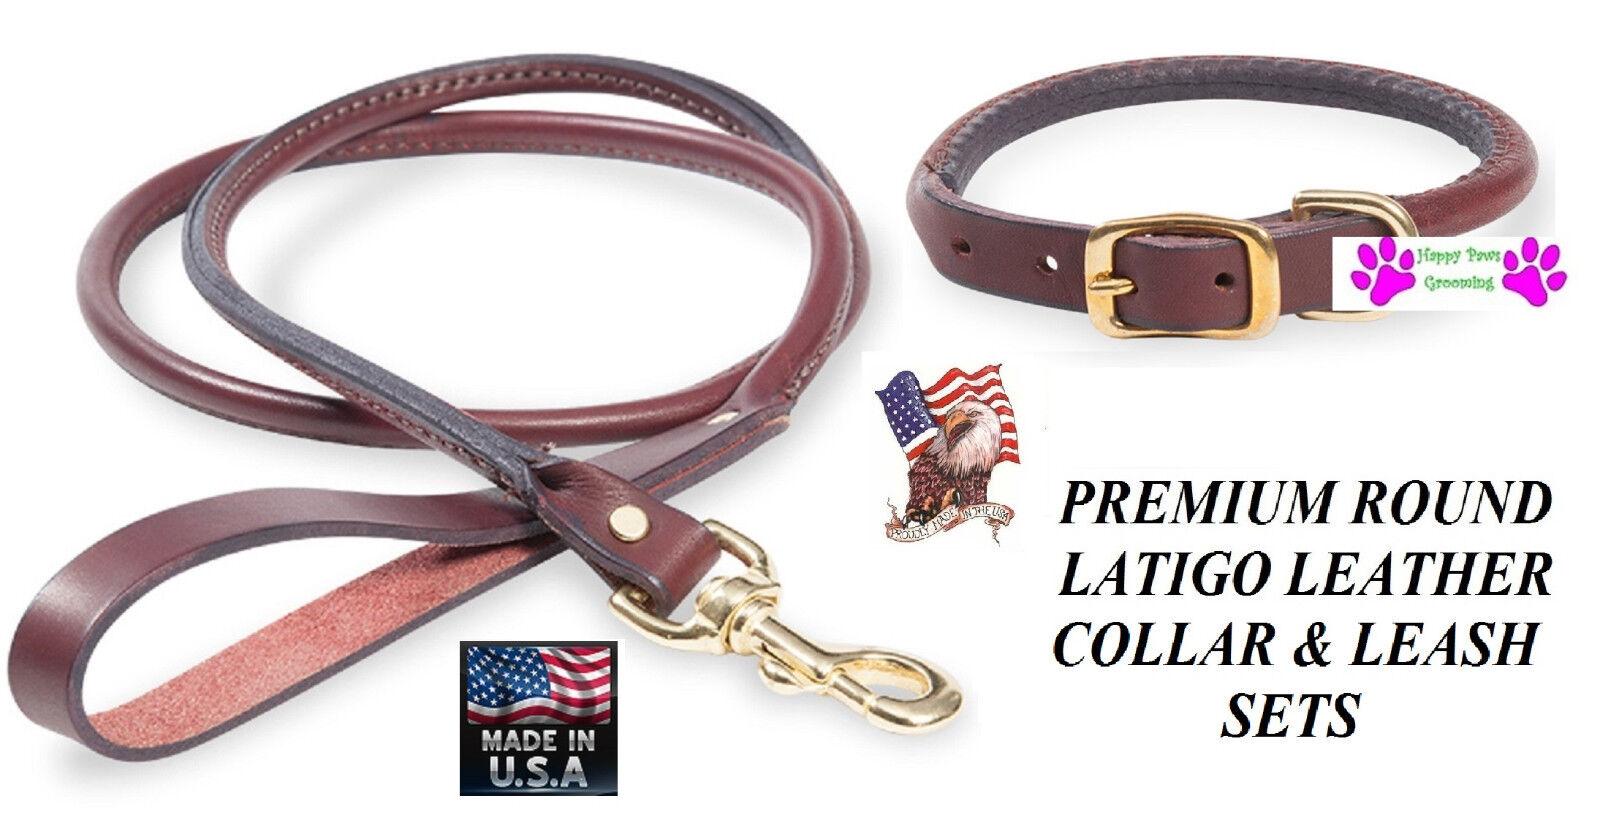 USA Herstellung Latigo Leder Gerollt Rund Hund Collar&leash Set Premium Robust     | Smart